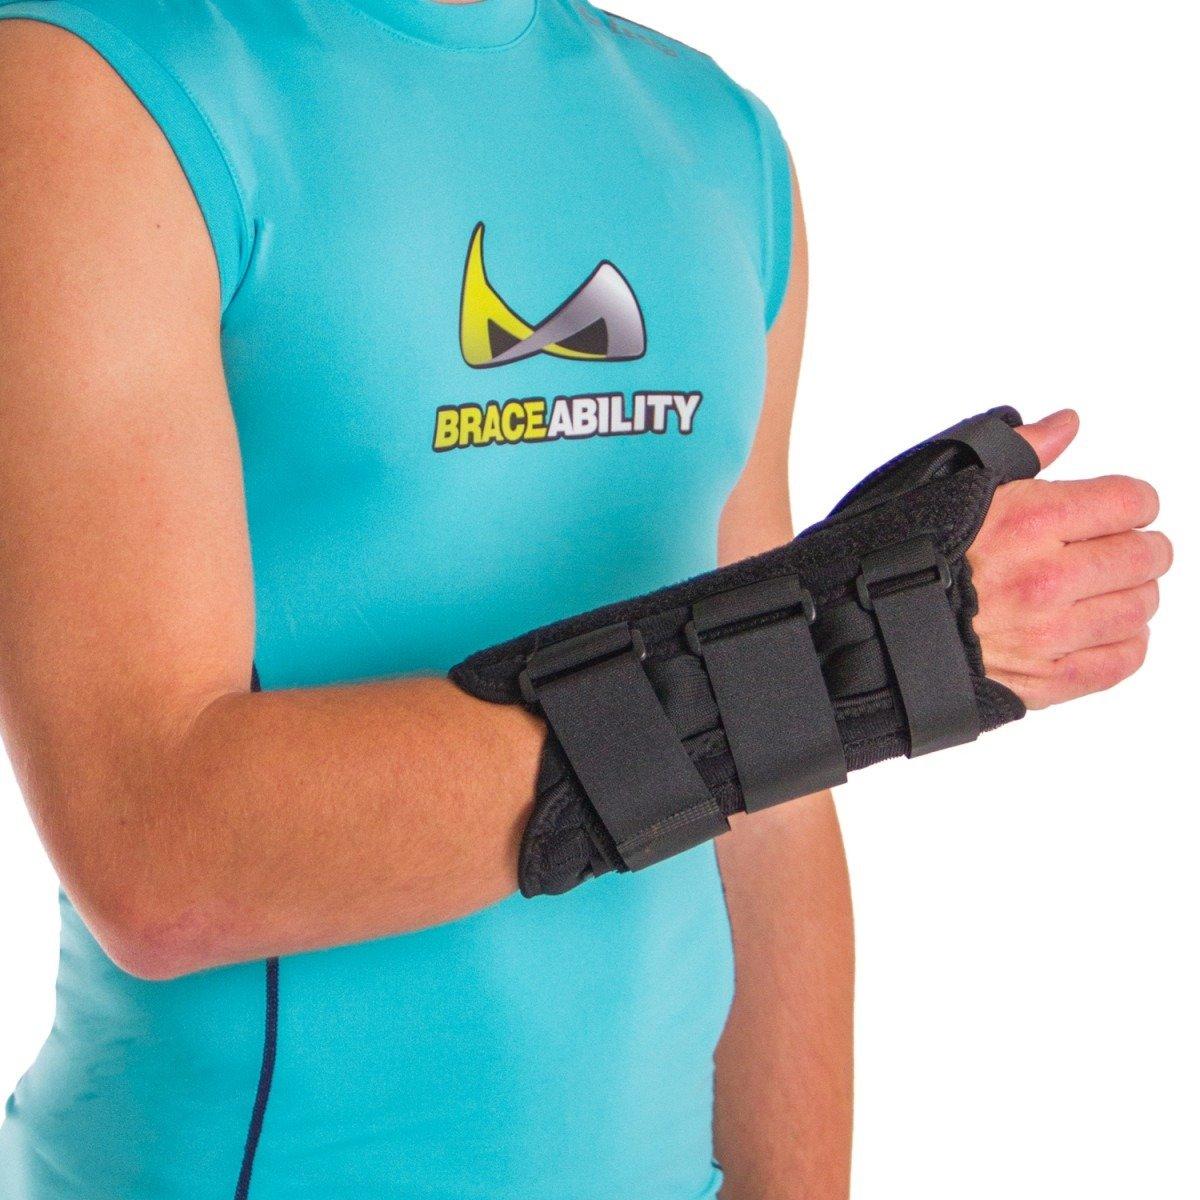 BraceAbility Thumb & Wrist Tendonitis Splint | Immobilizes Thumb Joint to Treat De Quervain's Tenosynovitis Tendon Pain, Swelling & Inflammatory Arthritis (S - Left Hand)